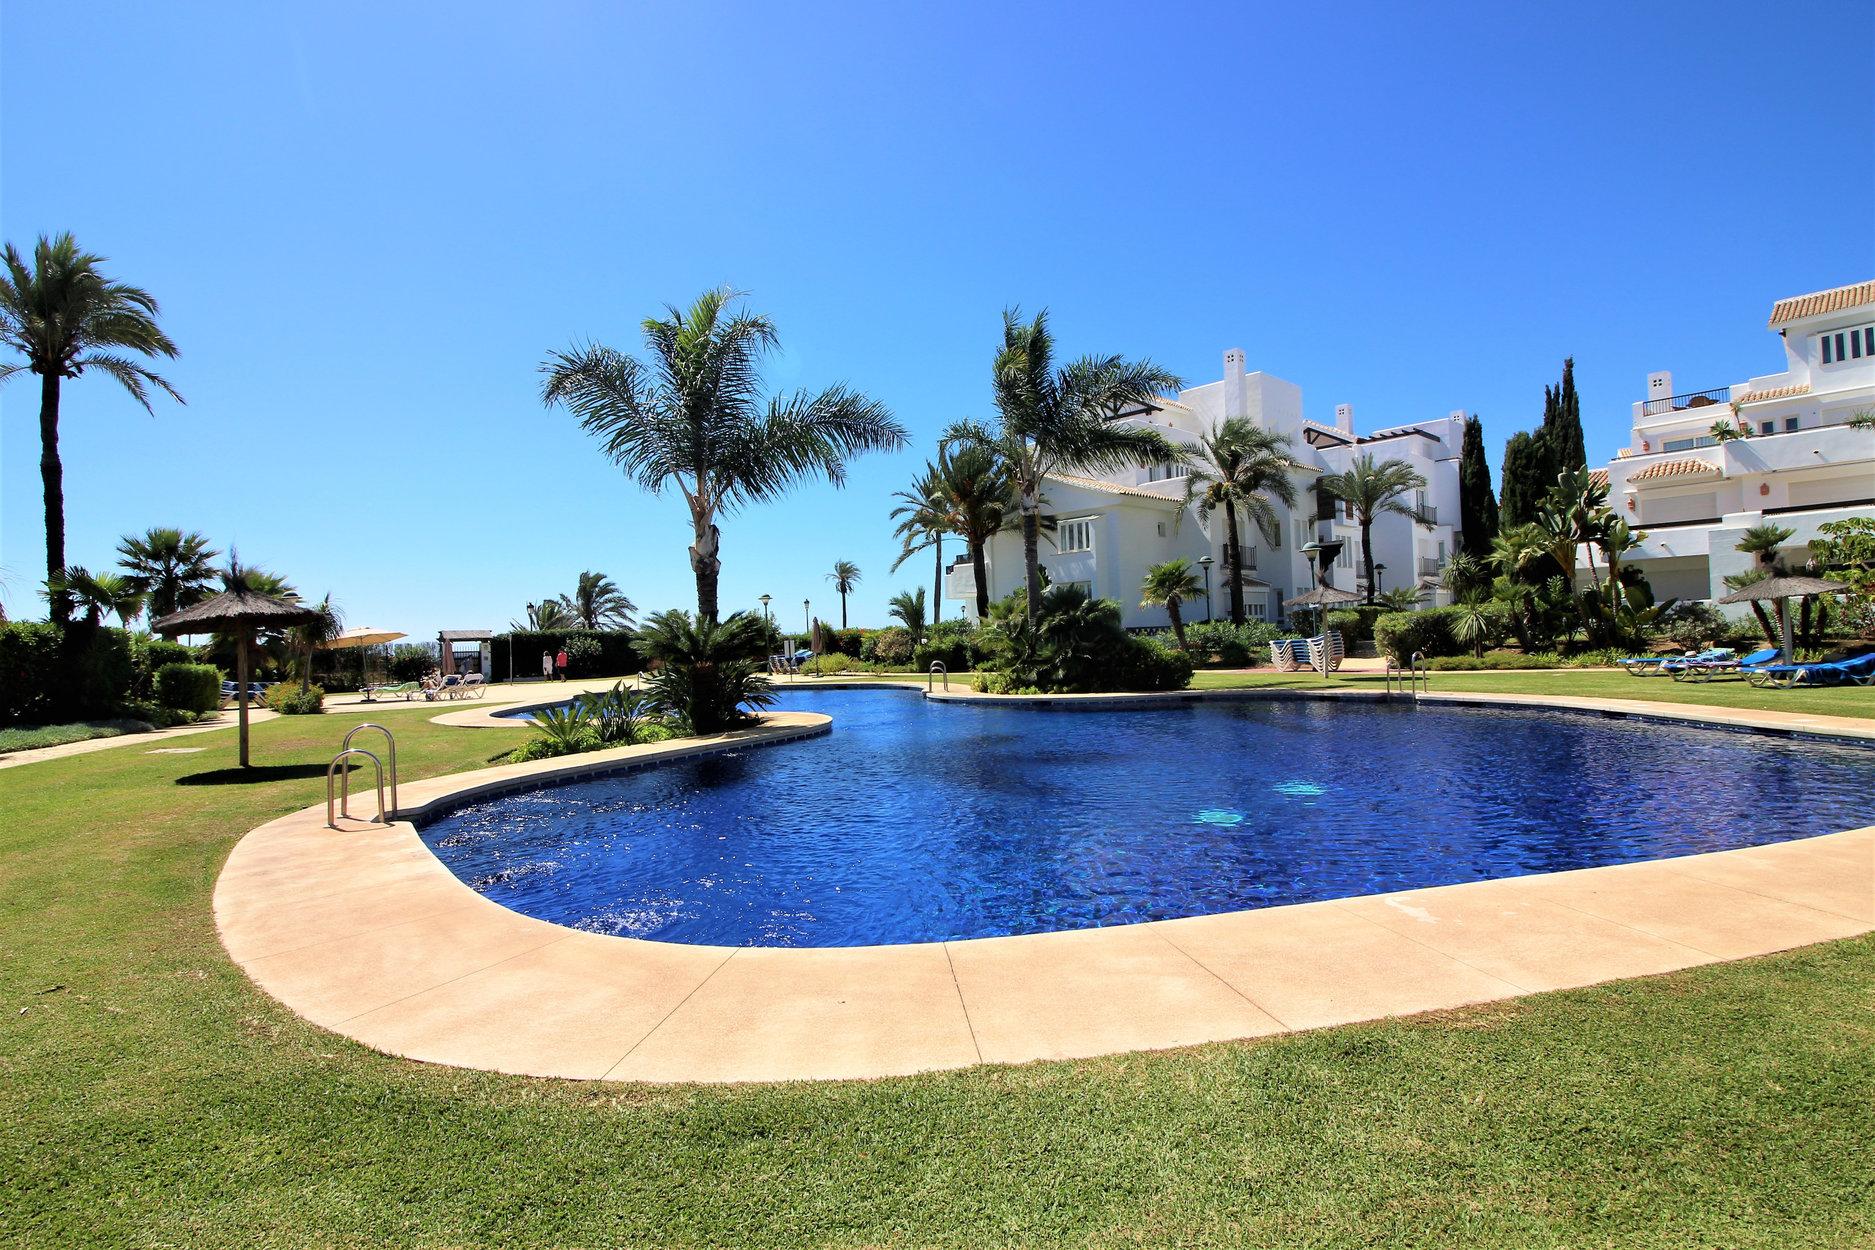 Penthouse till salu i Marbella, Los Monteros Palm Beach